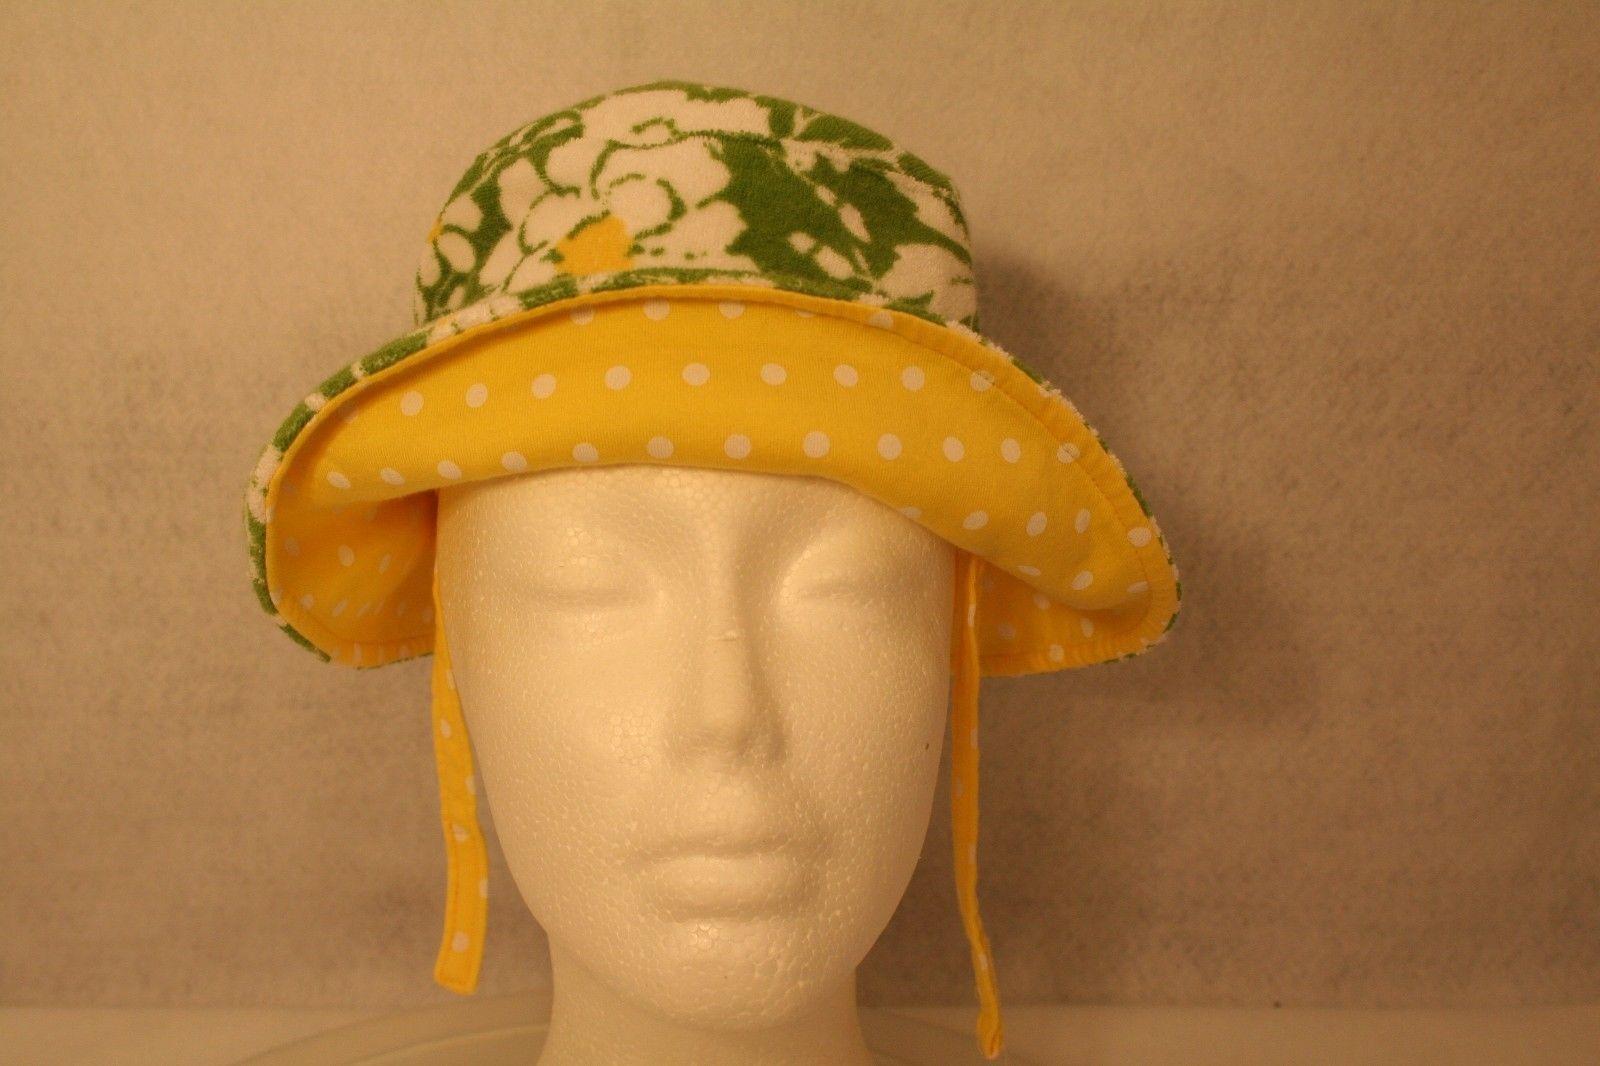 Janie & Jack Child Reversible Sun Hat Green daisy yellow polka dot w/adjust ties image 2